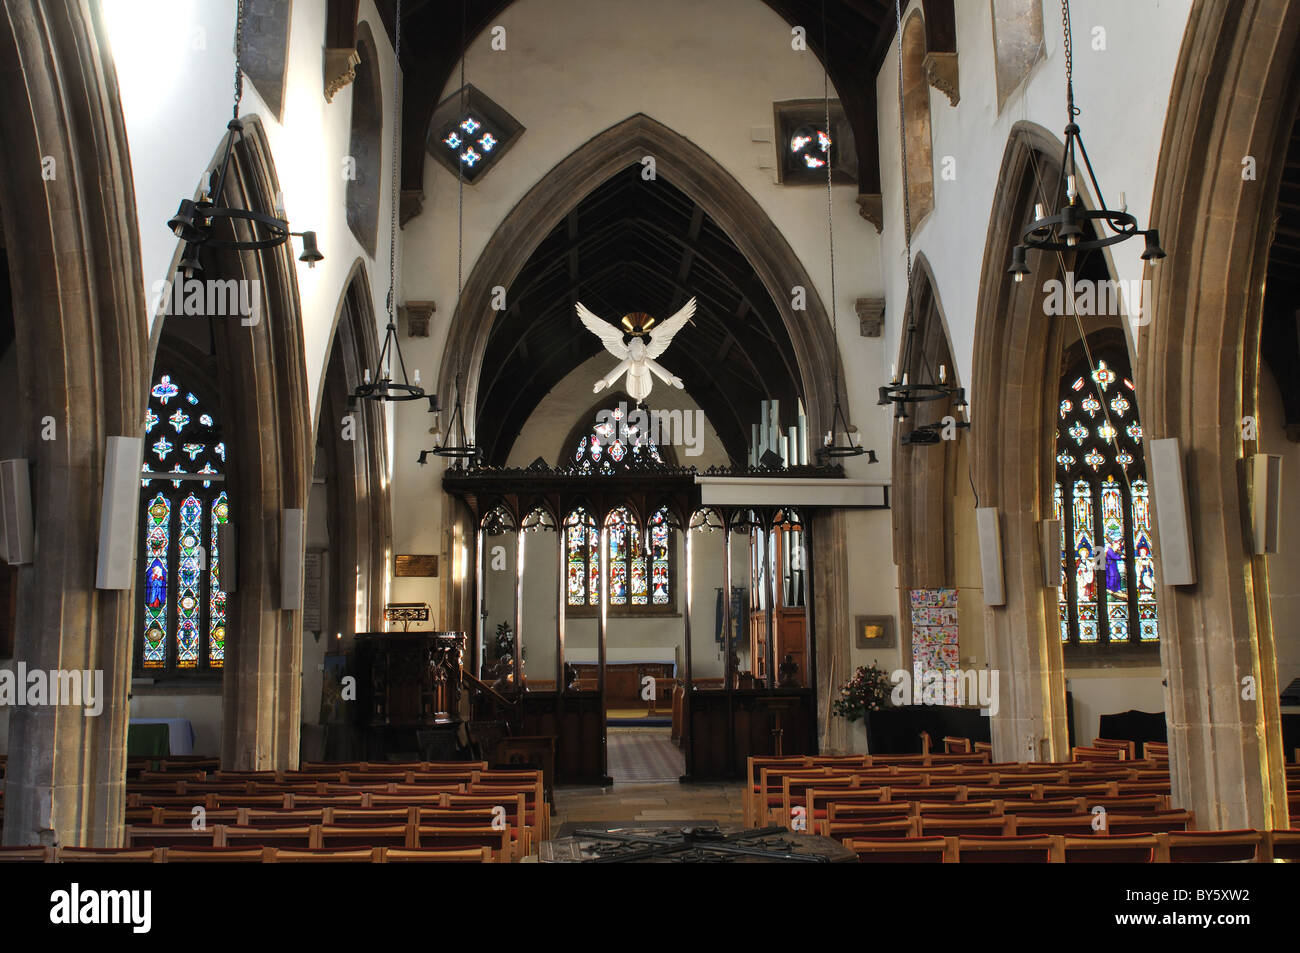 St. Wilfrid`s Church, Kibworth, Leicestershire, England, UK - Stock Image